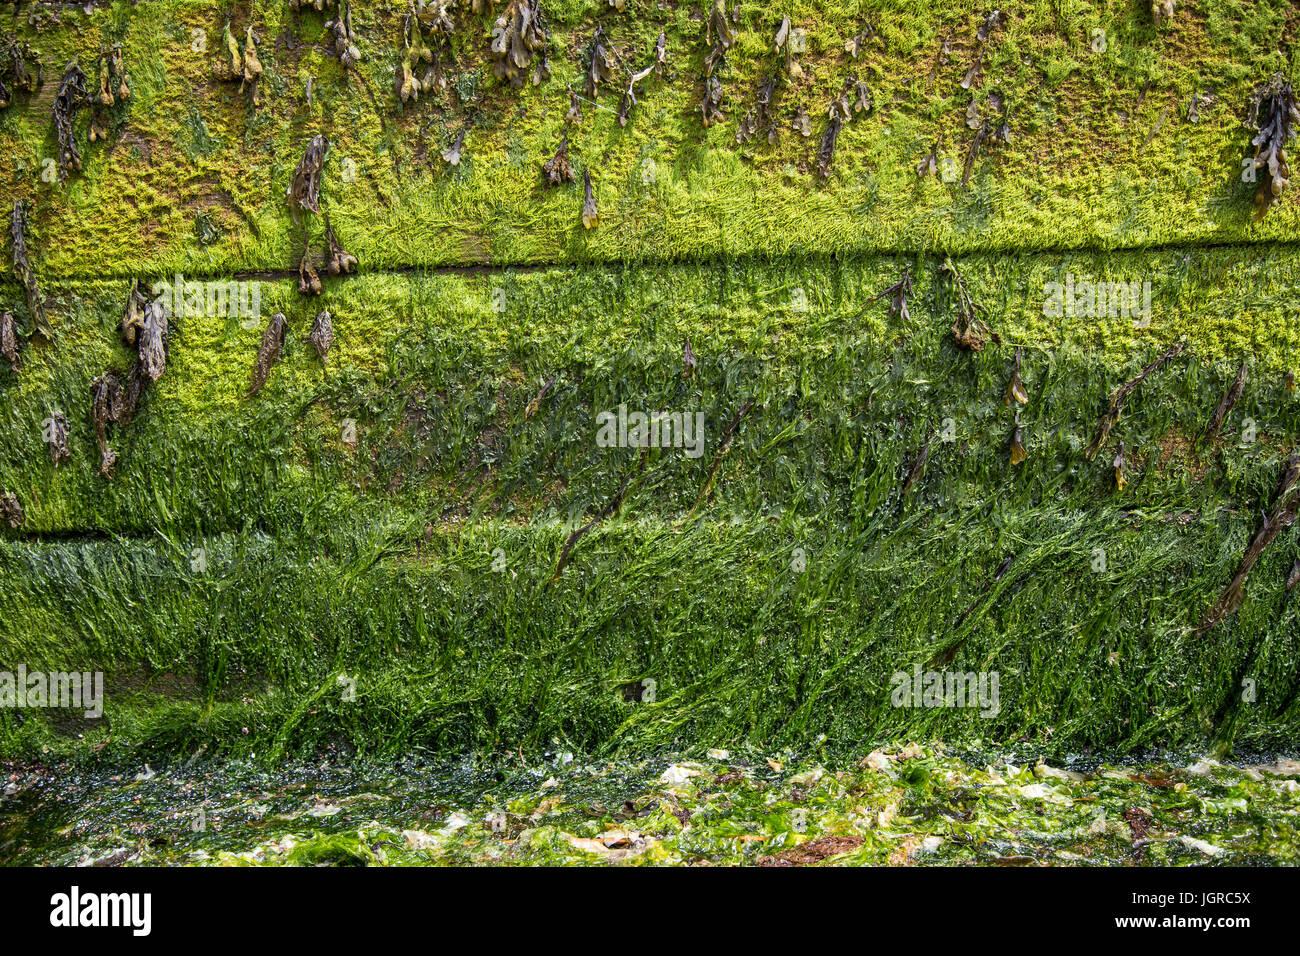 sea defences covered in green seaweed and algae,background, beach, breakwater, bright, close, coast, coastal, coastline, - Stock Image